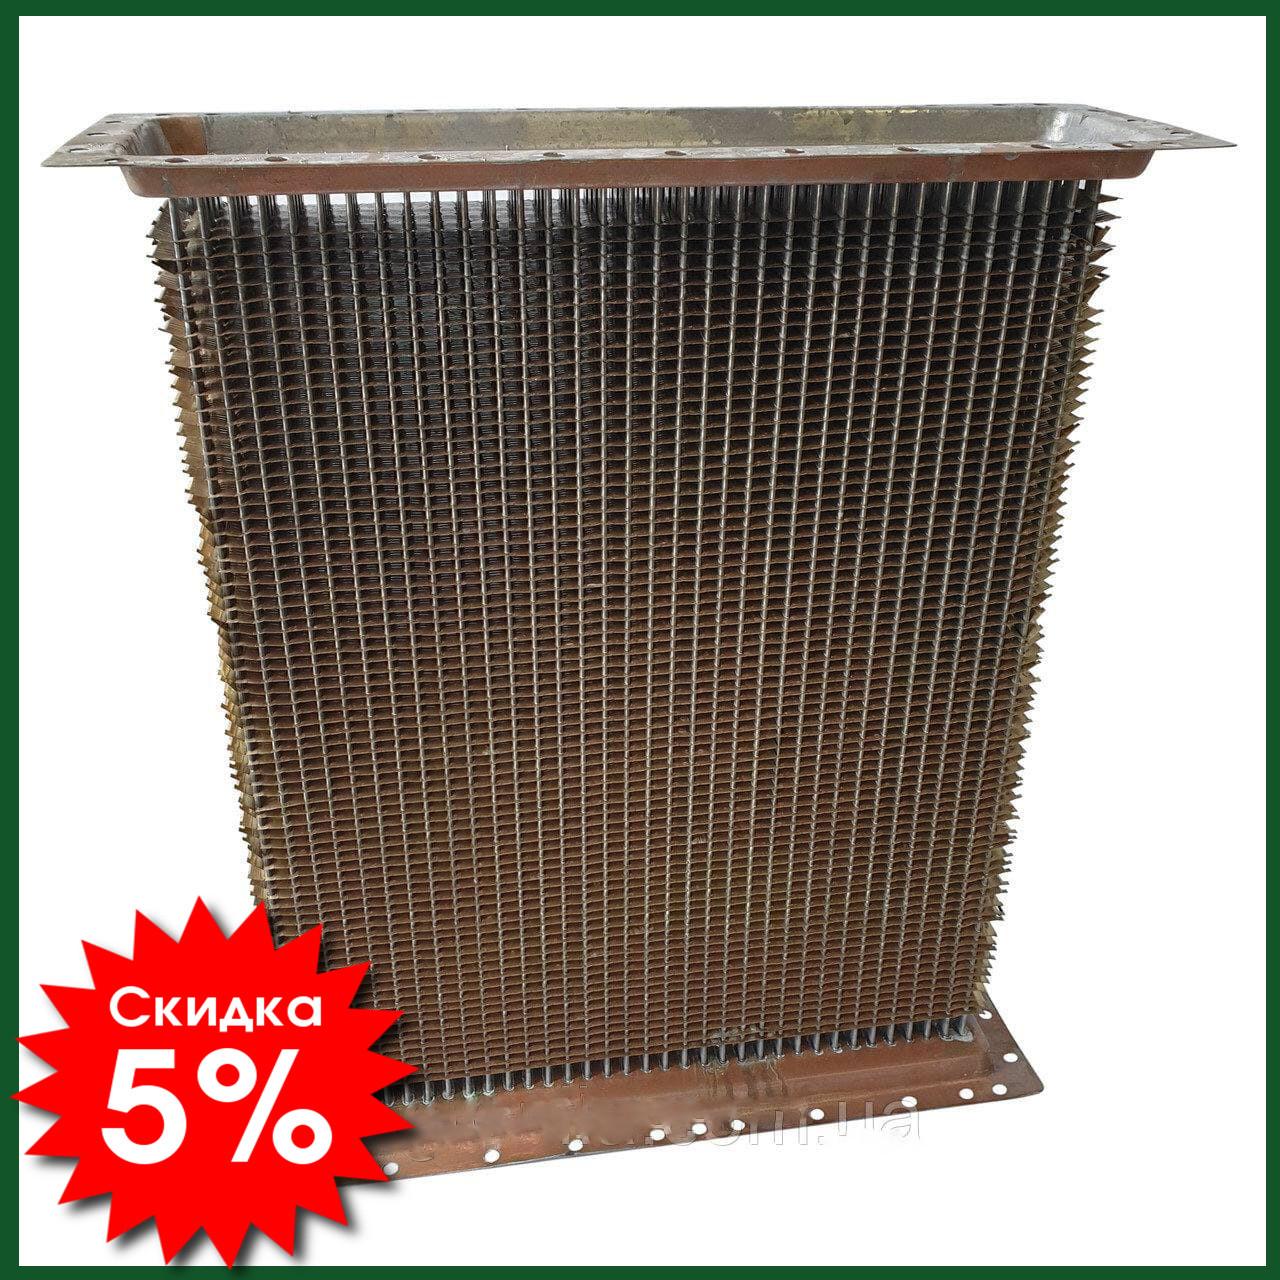 Сердцевина радиатора  МТЗ, Д-240, Д243 латунная